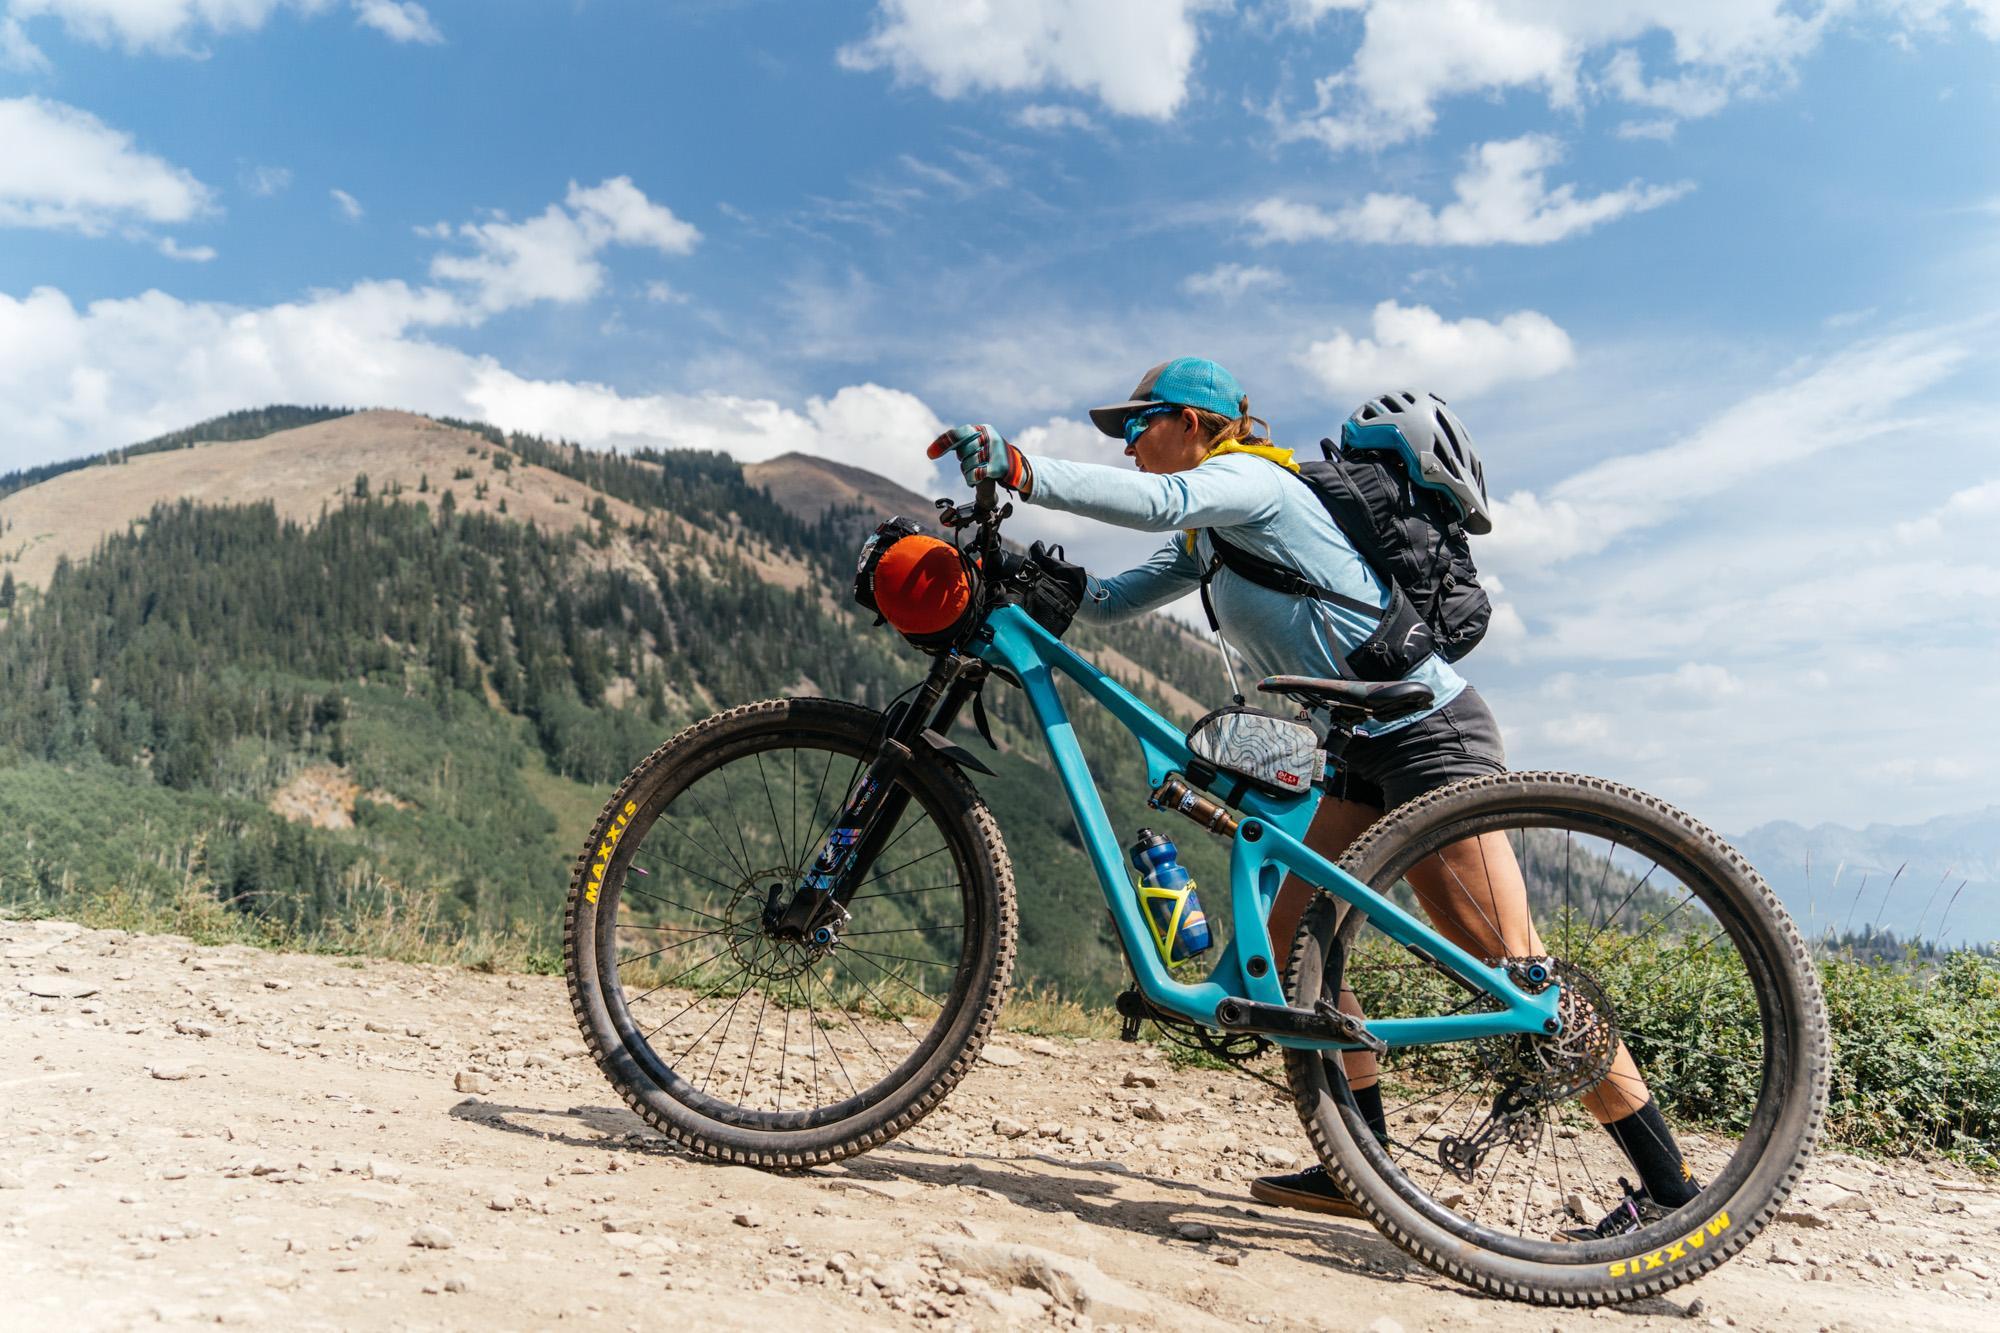 Low-range hike a bike